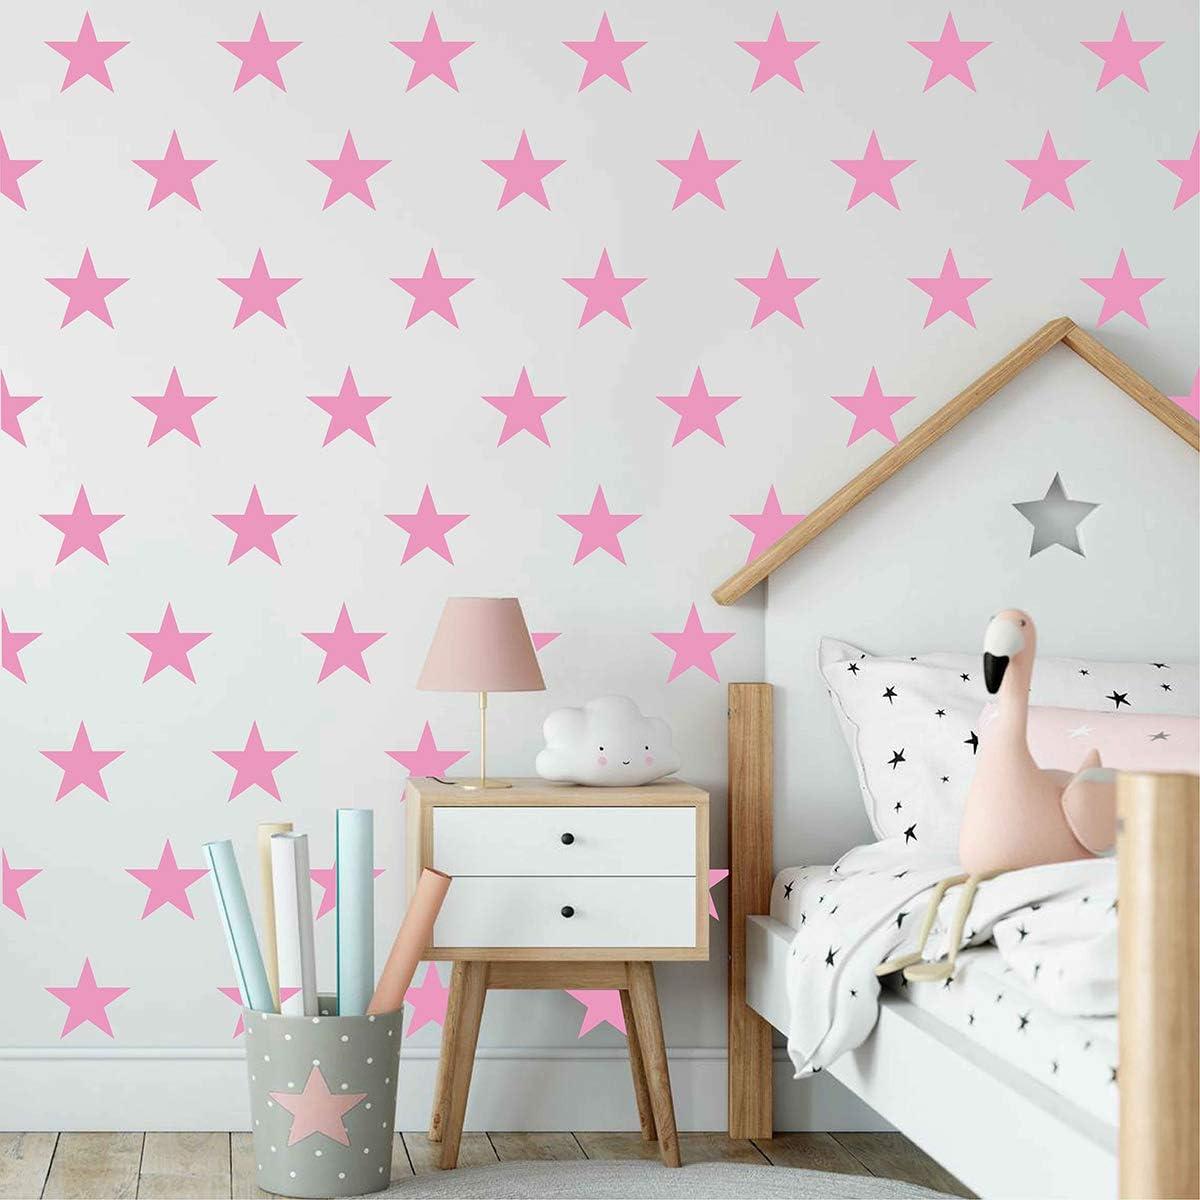 Amazon Com Melissalove 48pcs Set Of Stars Vinyl Wall Decor Stickers Diy White Star Wall Decals Art For Kids Nursery Room Decor Mural Wallpaper D399 Pink Arts Crafts Sewing